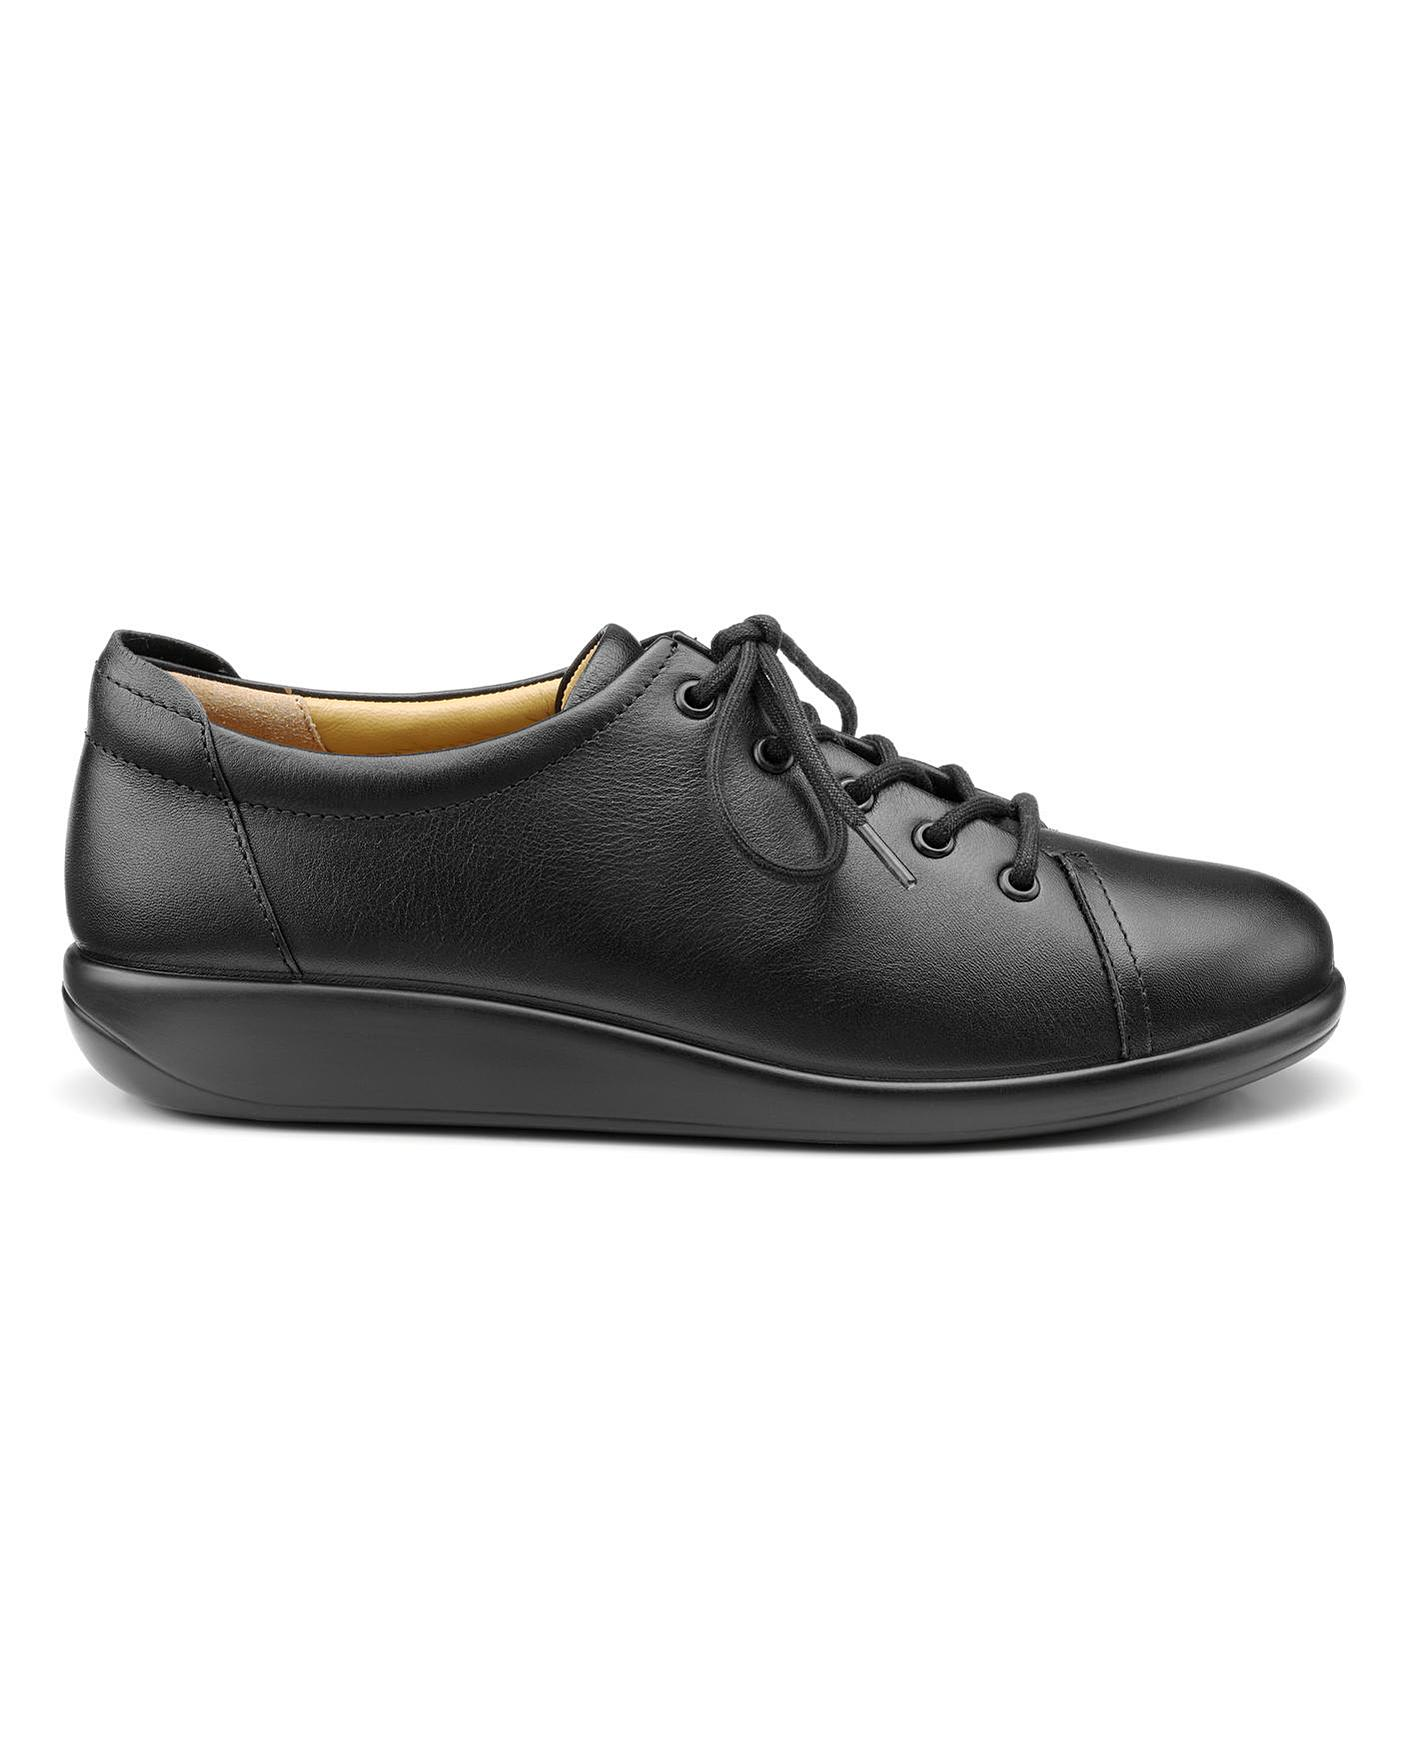 Hotter Dew EEE Fit Lace-Up Shoe | J D